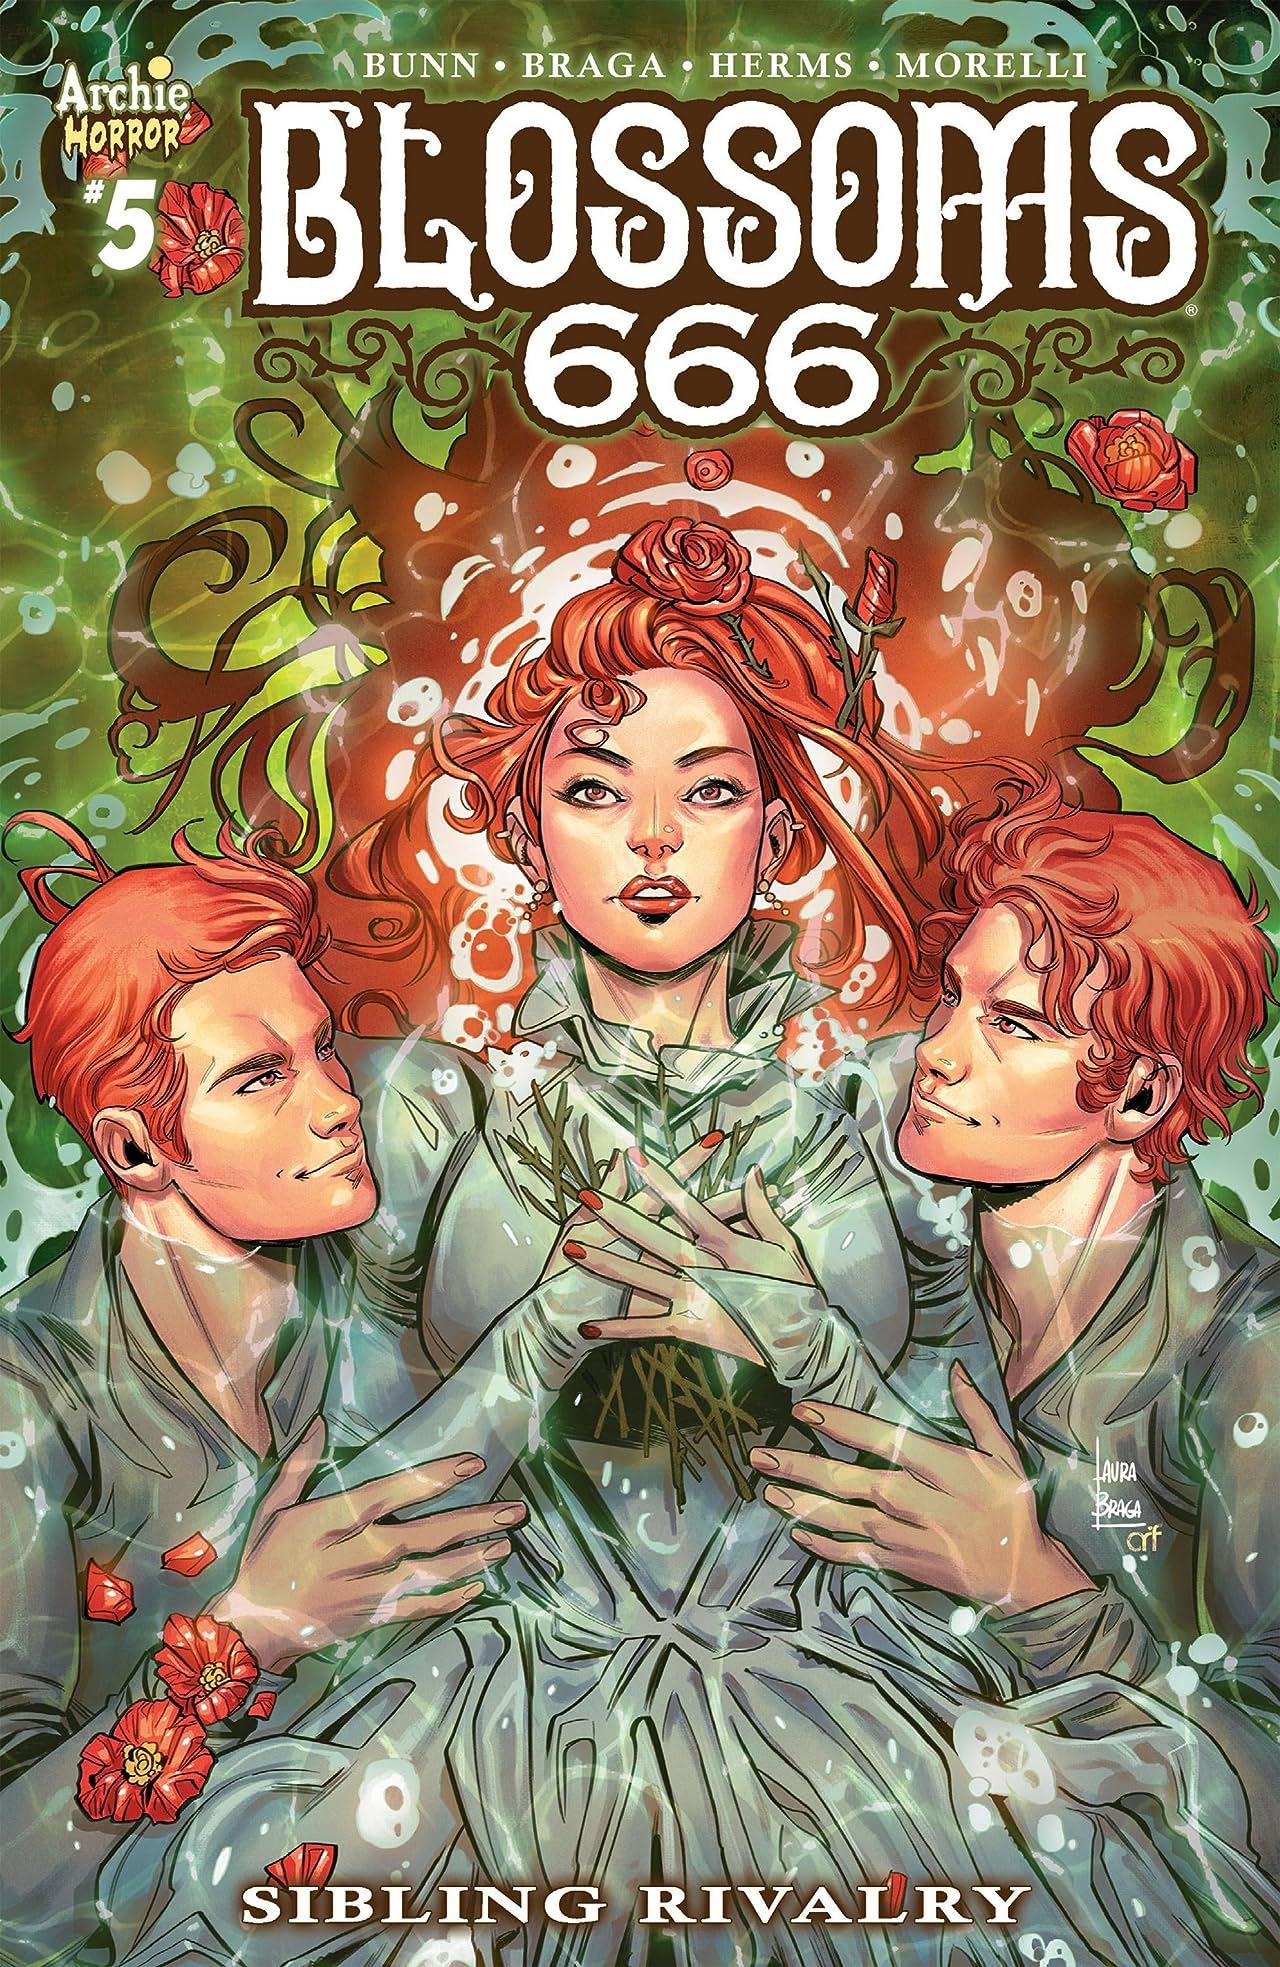 Blossoms: 666 #5